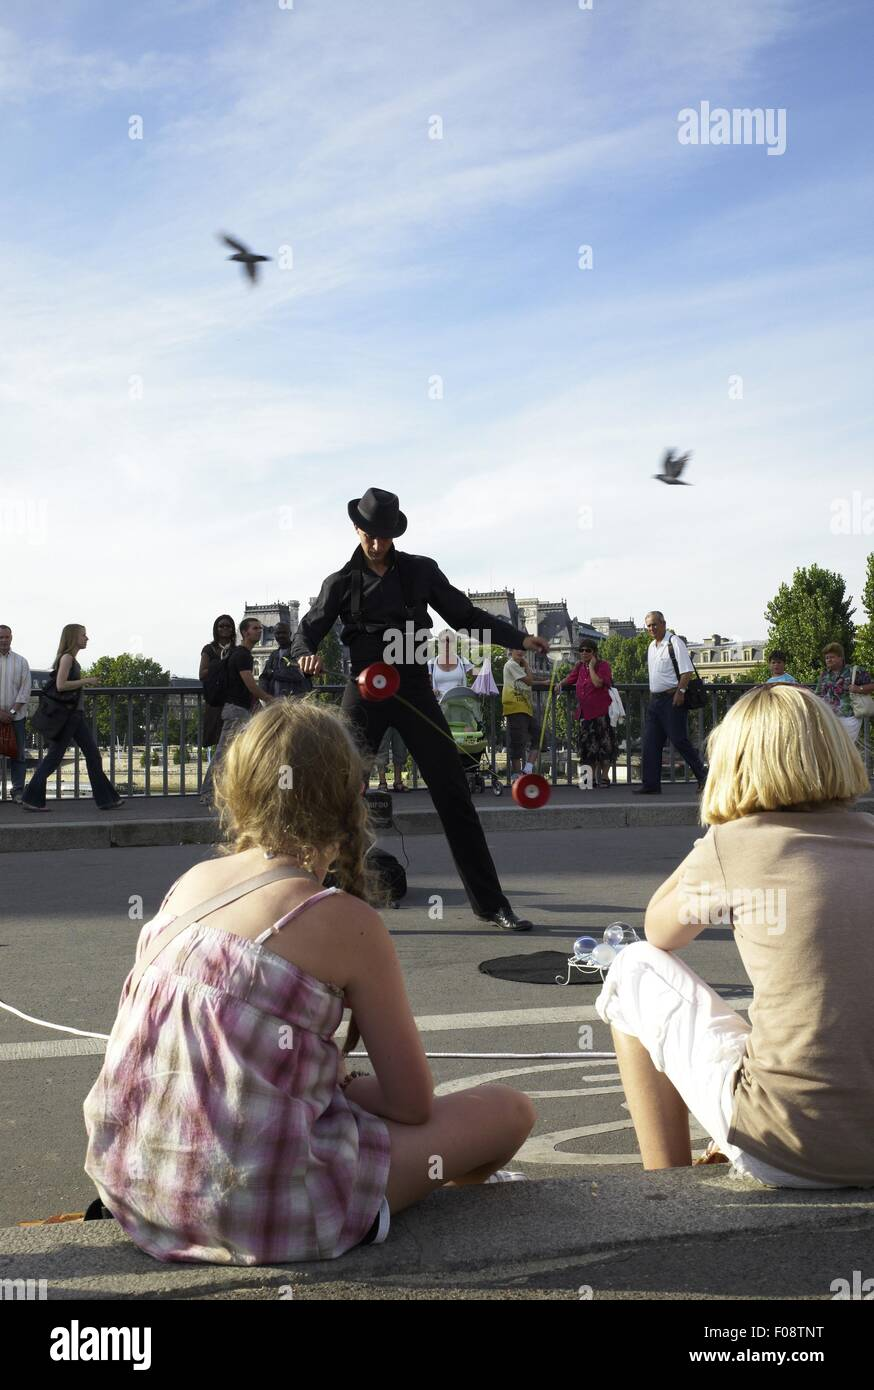 Juggler performing on Pont Saint-Louis bridge in Paris, France - Stock Image